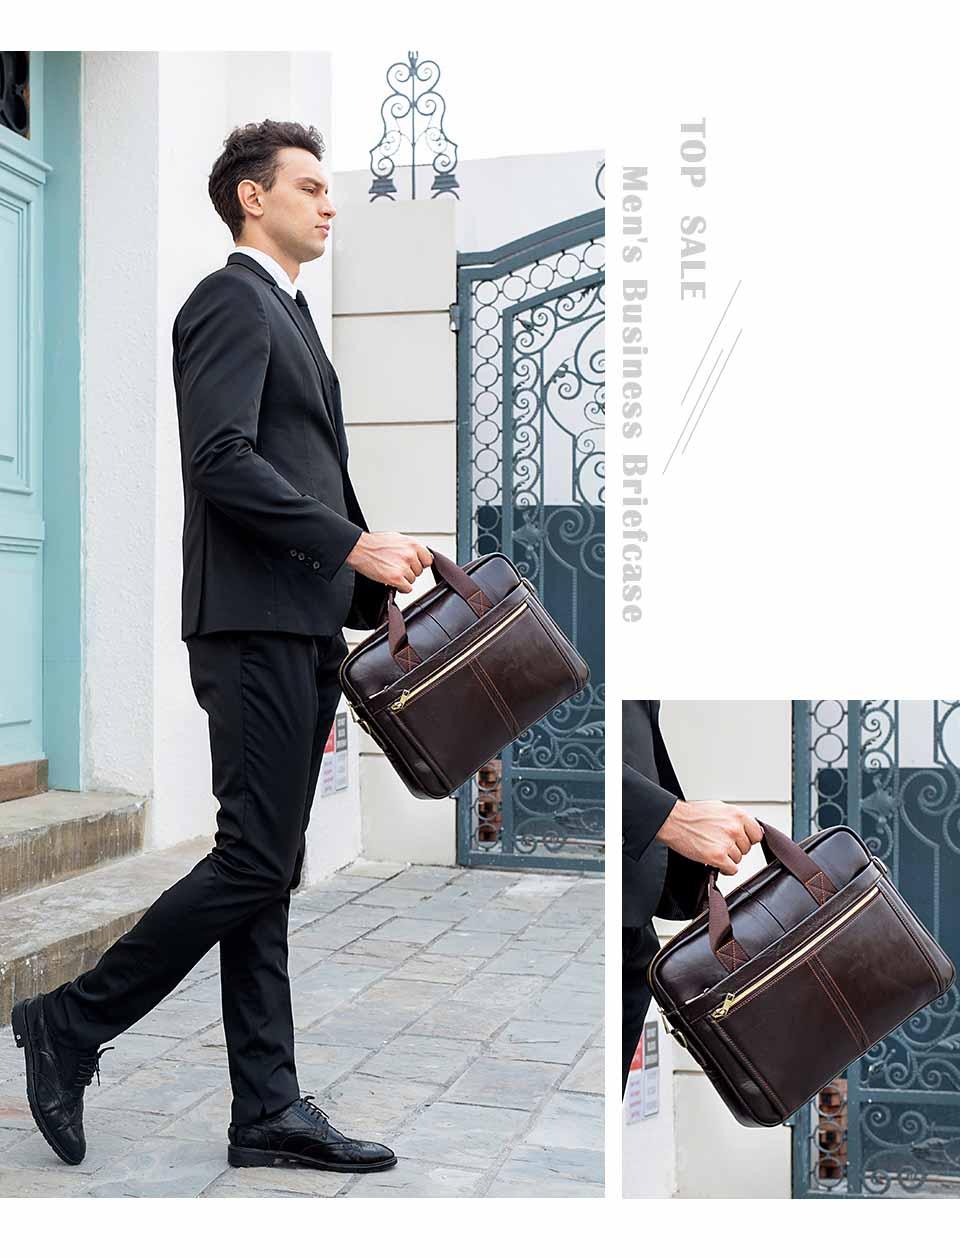 LAZYLIFE-briefcase-messenger-bag-men-s-genuine-leather-14-laptop-bag-men-s-briefcases-office-business (3)